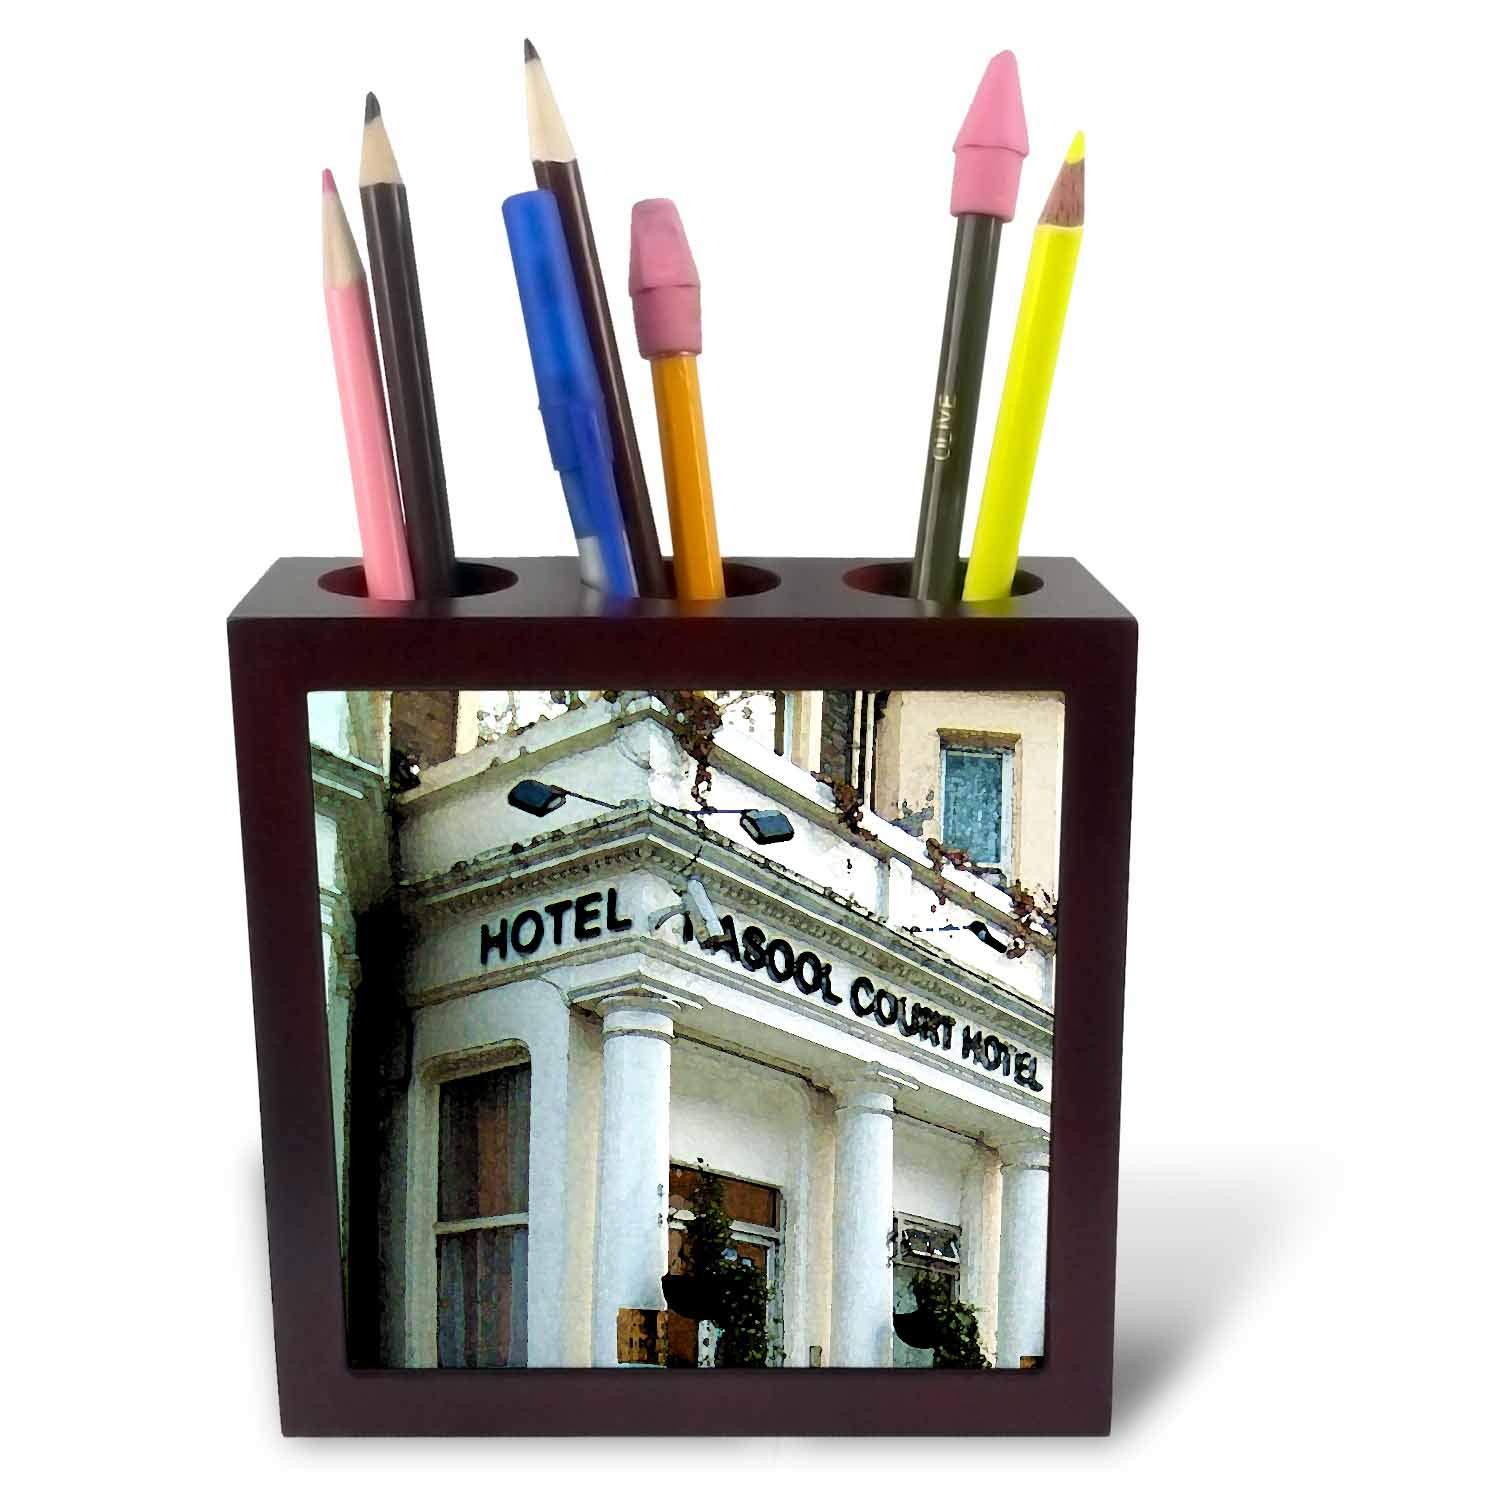 3dRose Jos Fauxtographee- London Watercolor Hotel - The Rasool Hotel in London Done in a Watercolor Effect - 5 inch Tile Pen Holder (ph_291340_1)